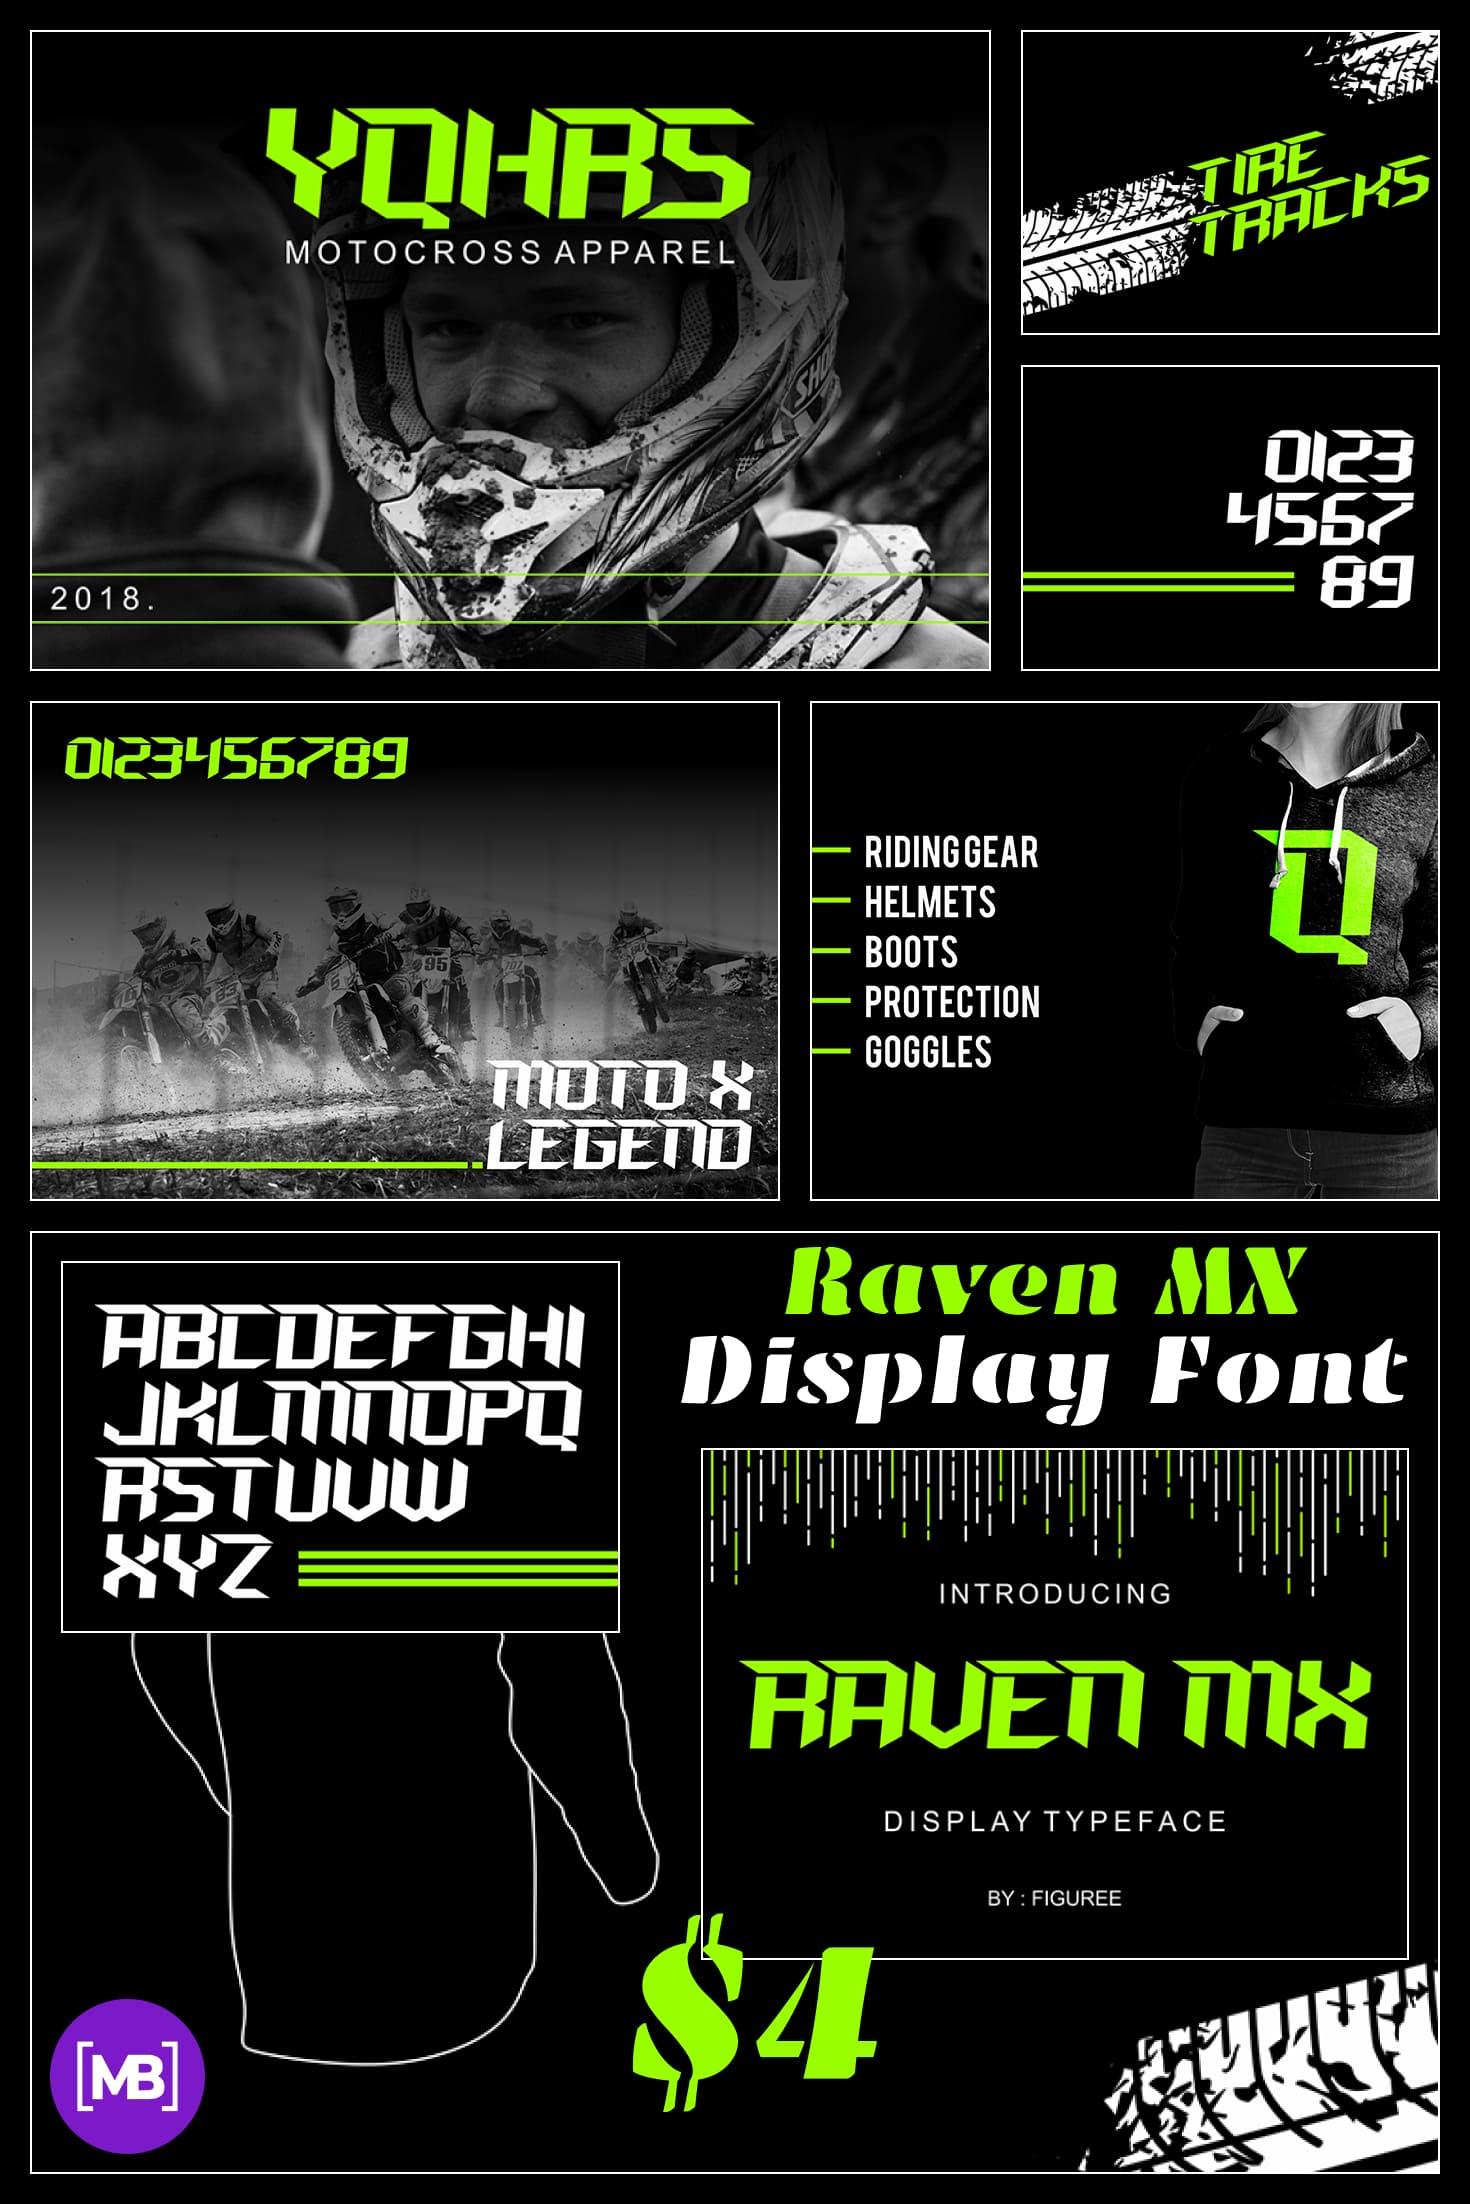 Pinterest Image: Raven MX Display Font - $4.